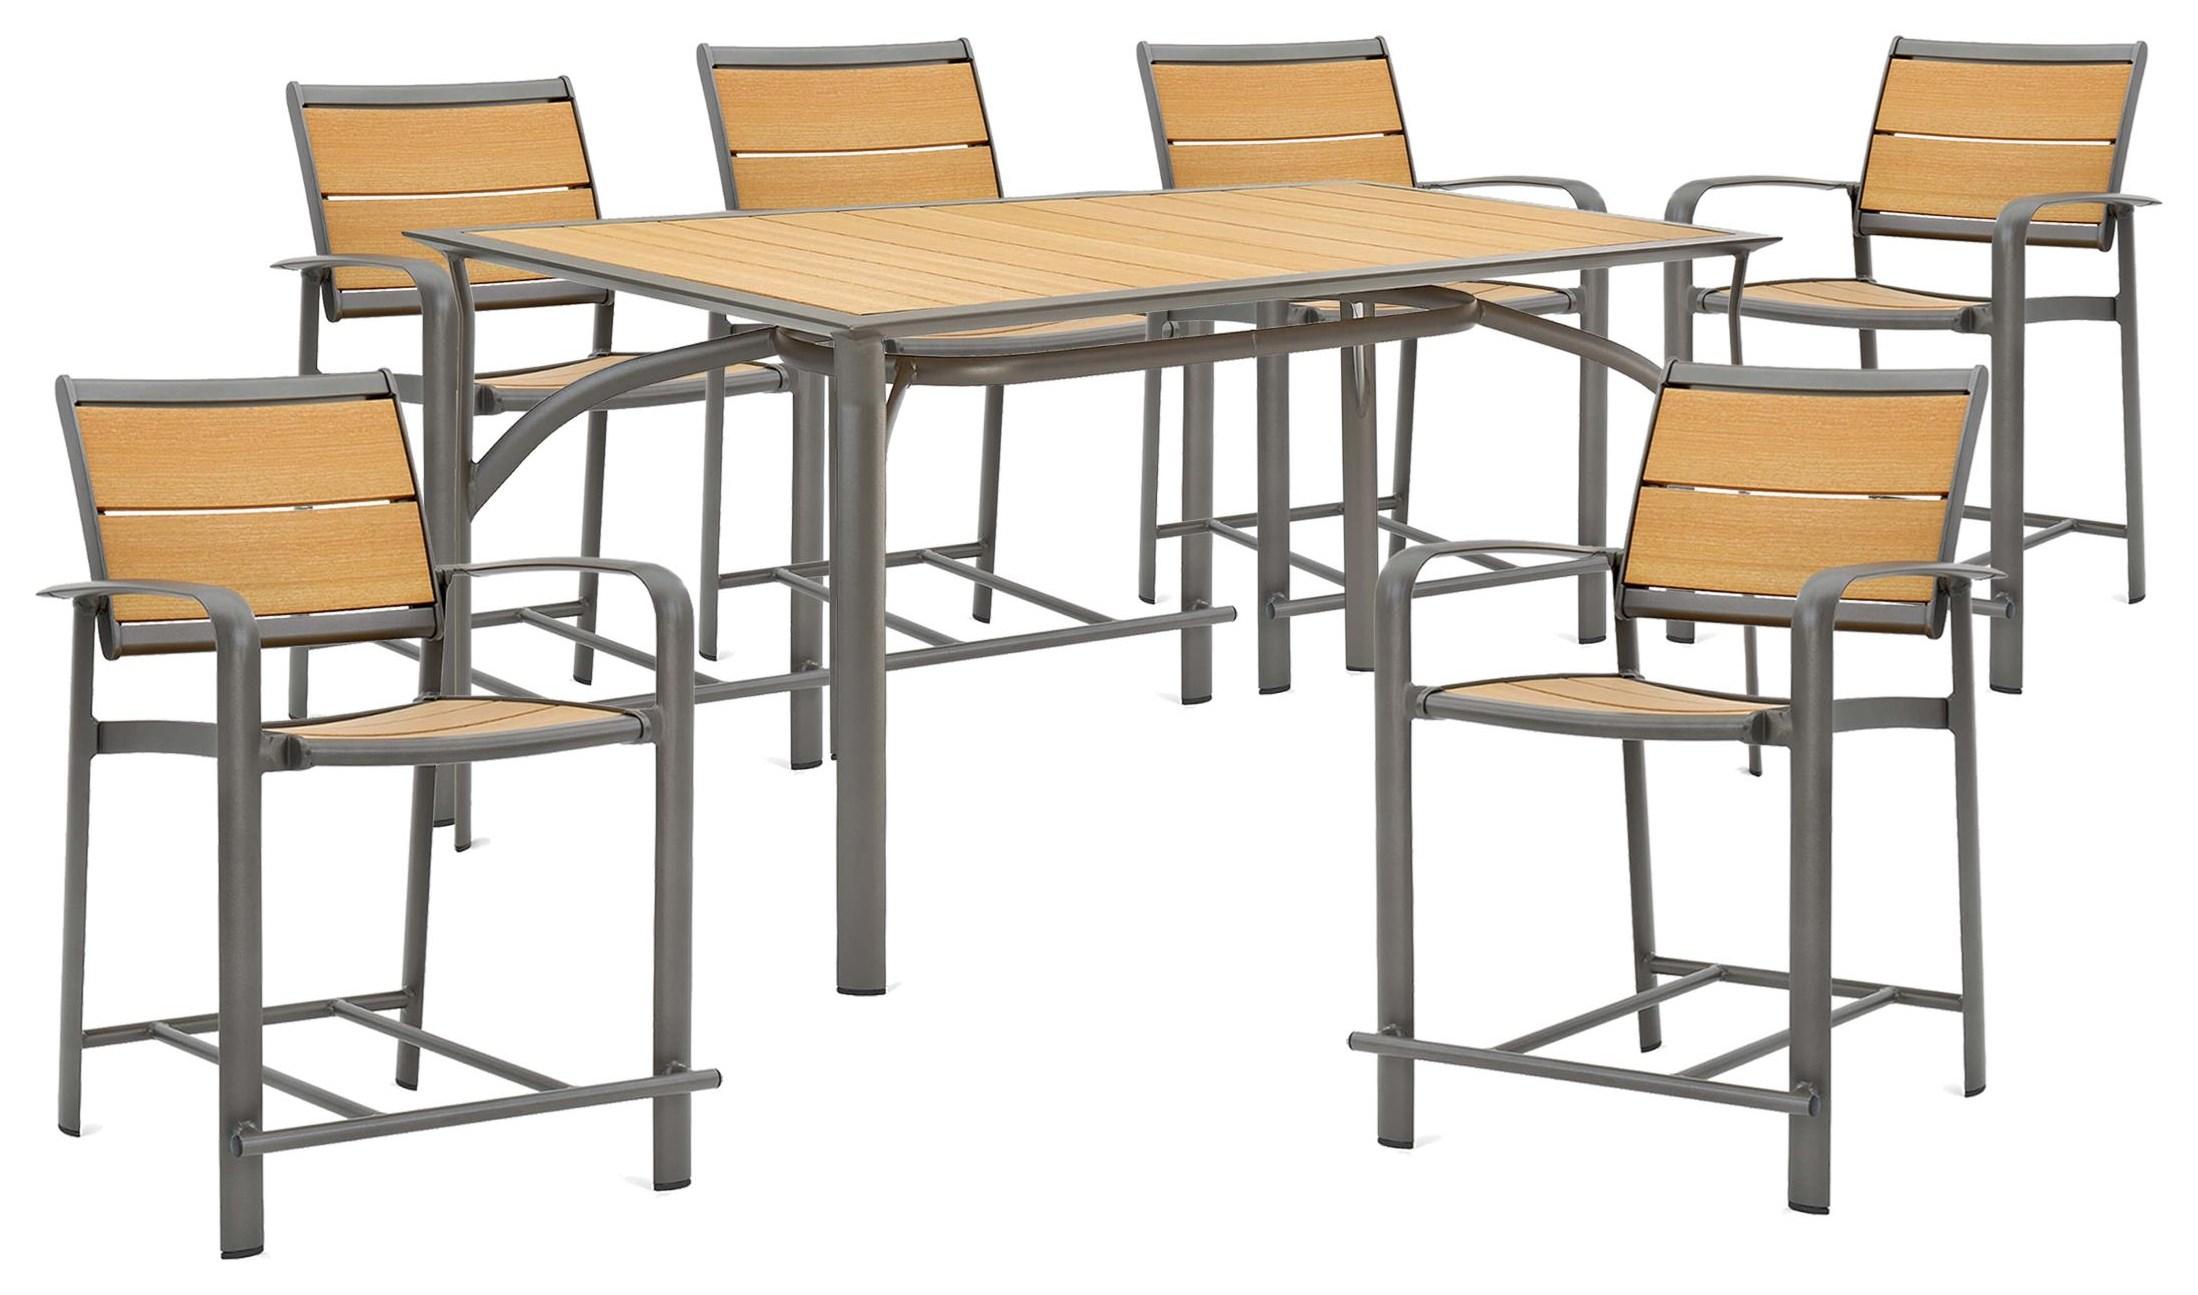 Harper 63 inch Balcony Table and Stools by Winston at Johnny Janosik